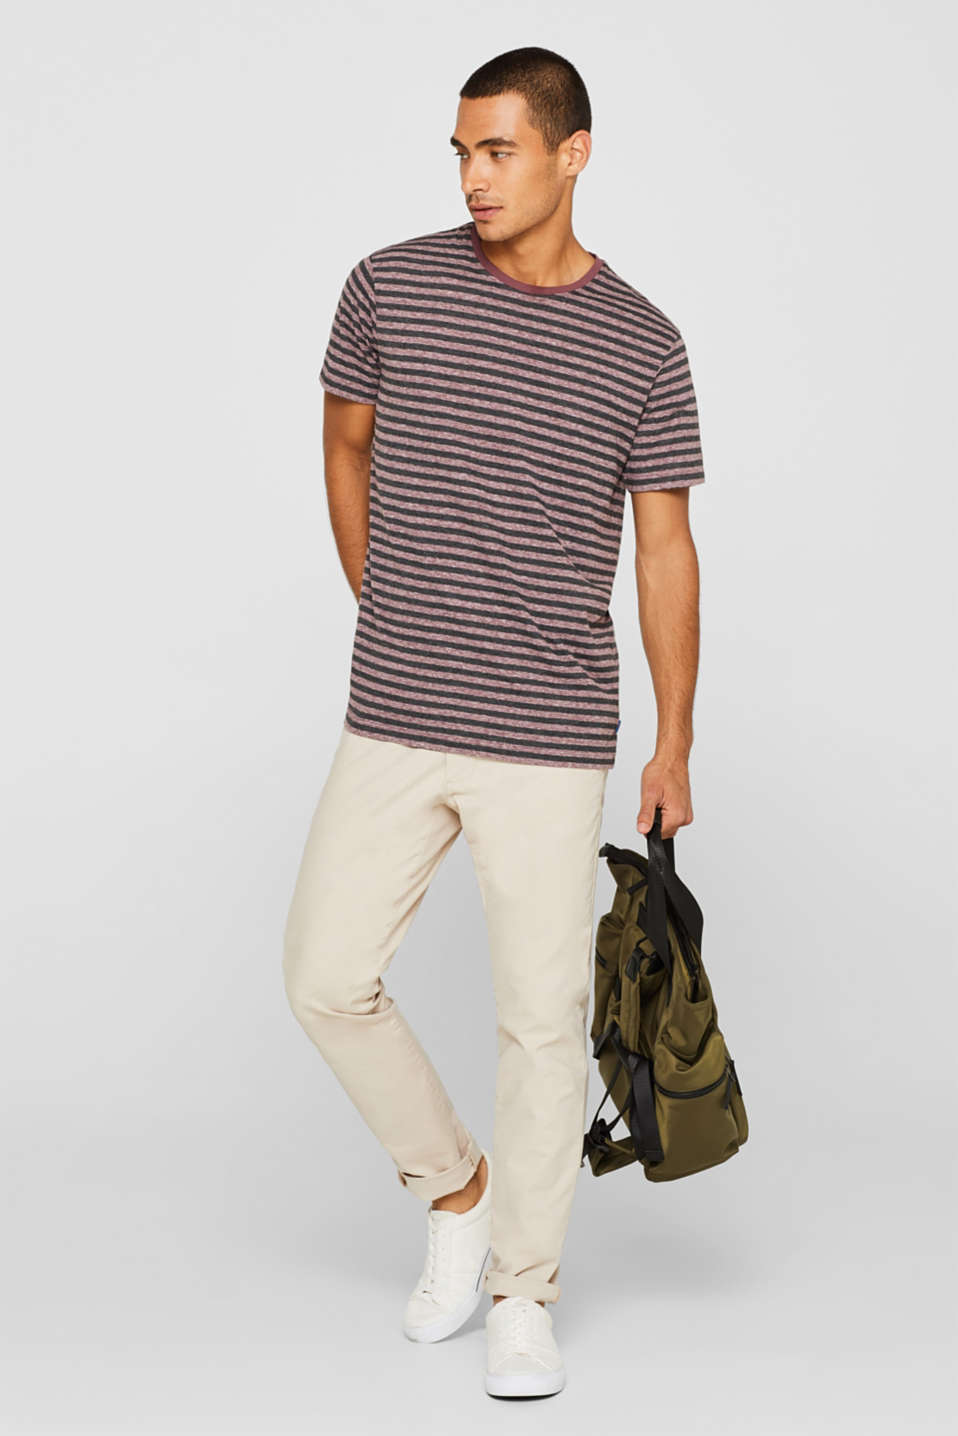 Striped jersey T-shirt, GARNET RED, detail image number 2